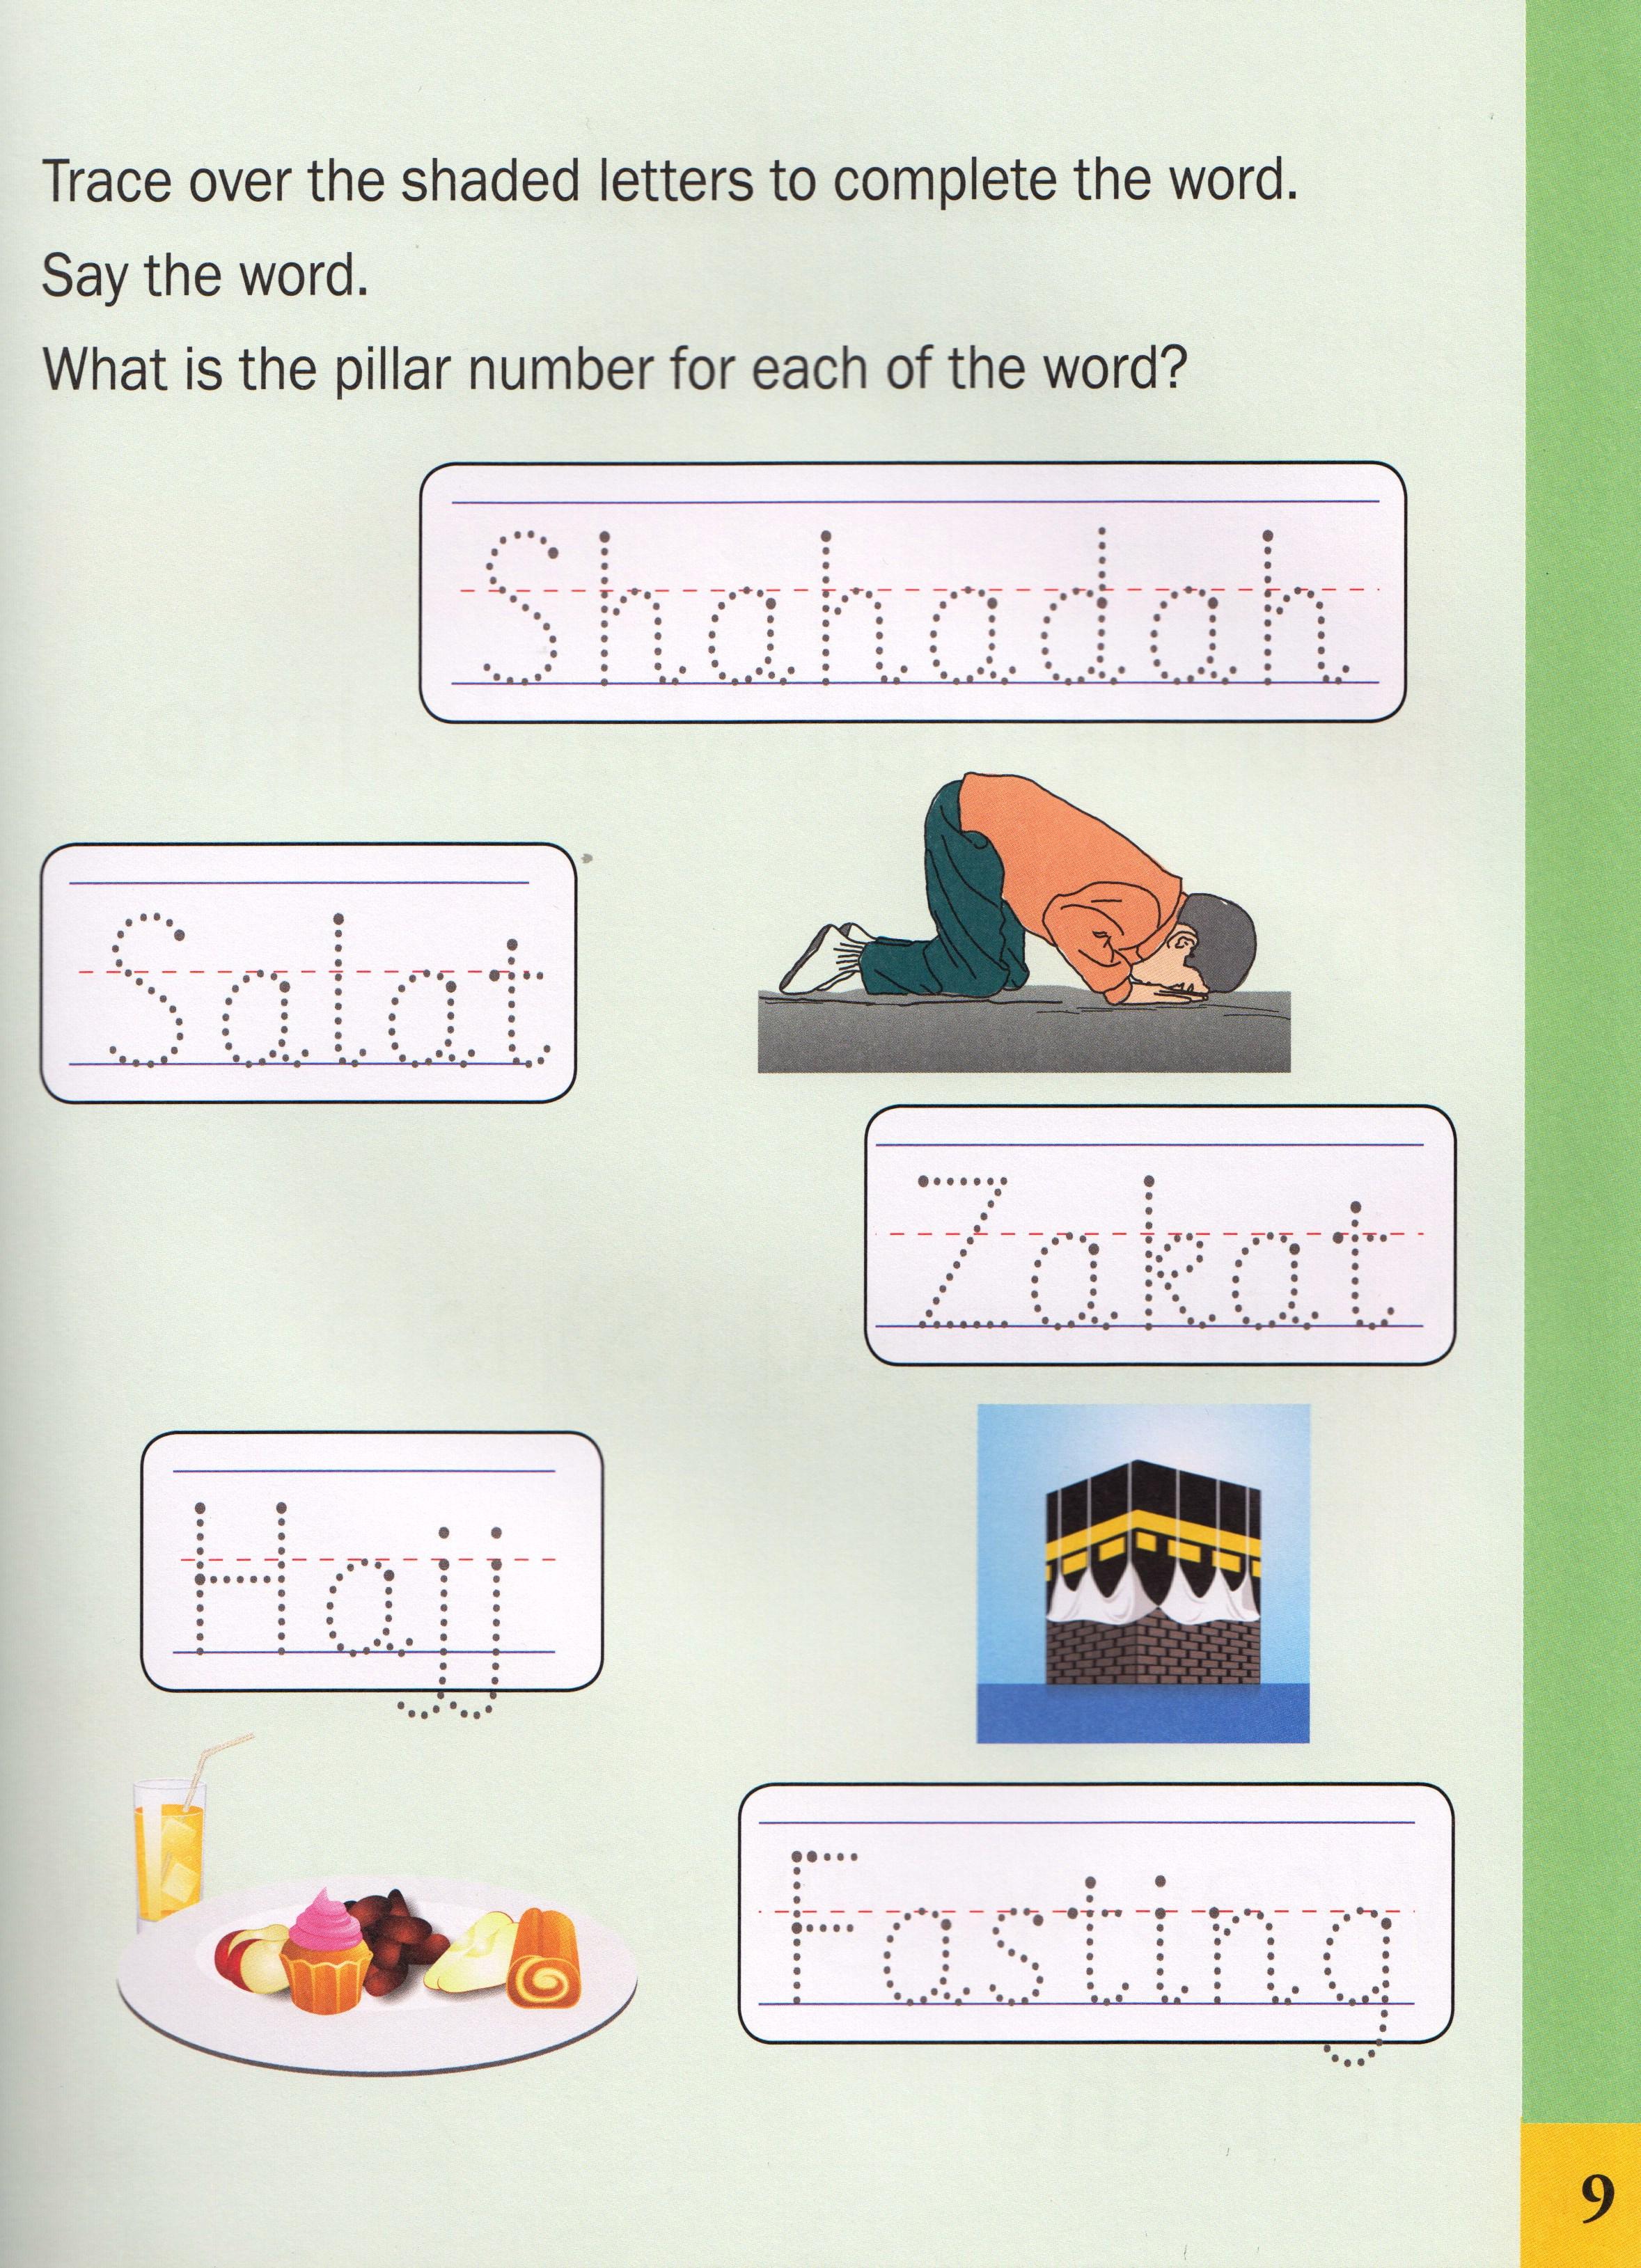 5 Pillars Of Islam Activity Book Wlp